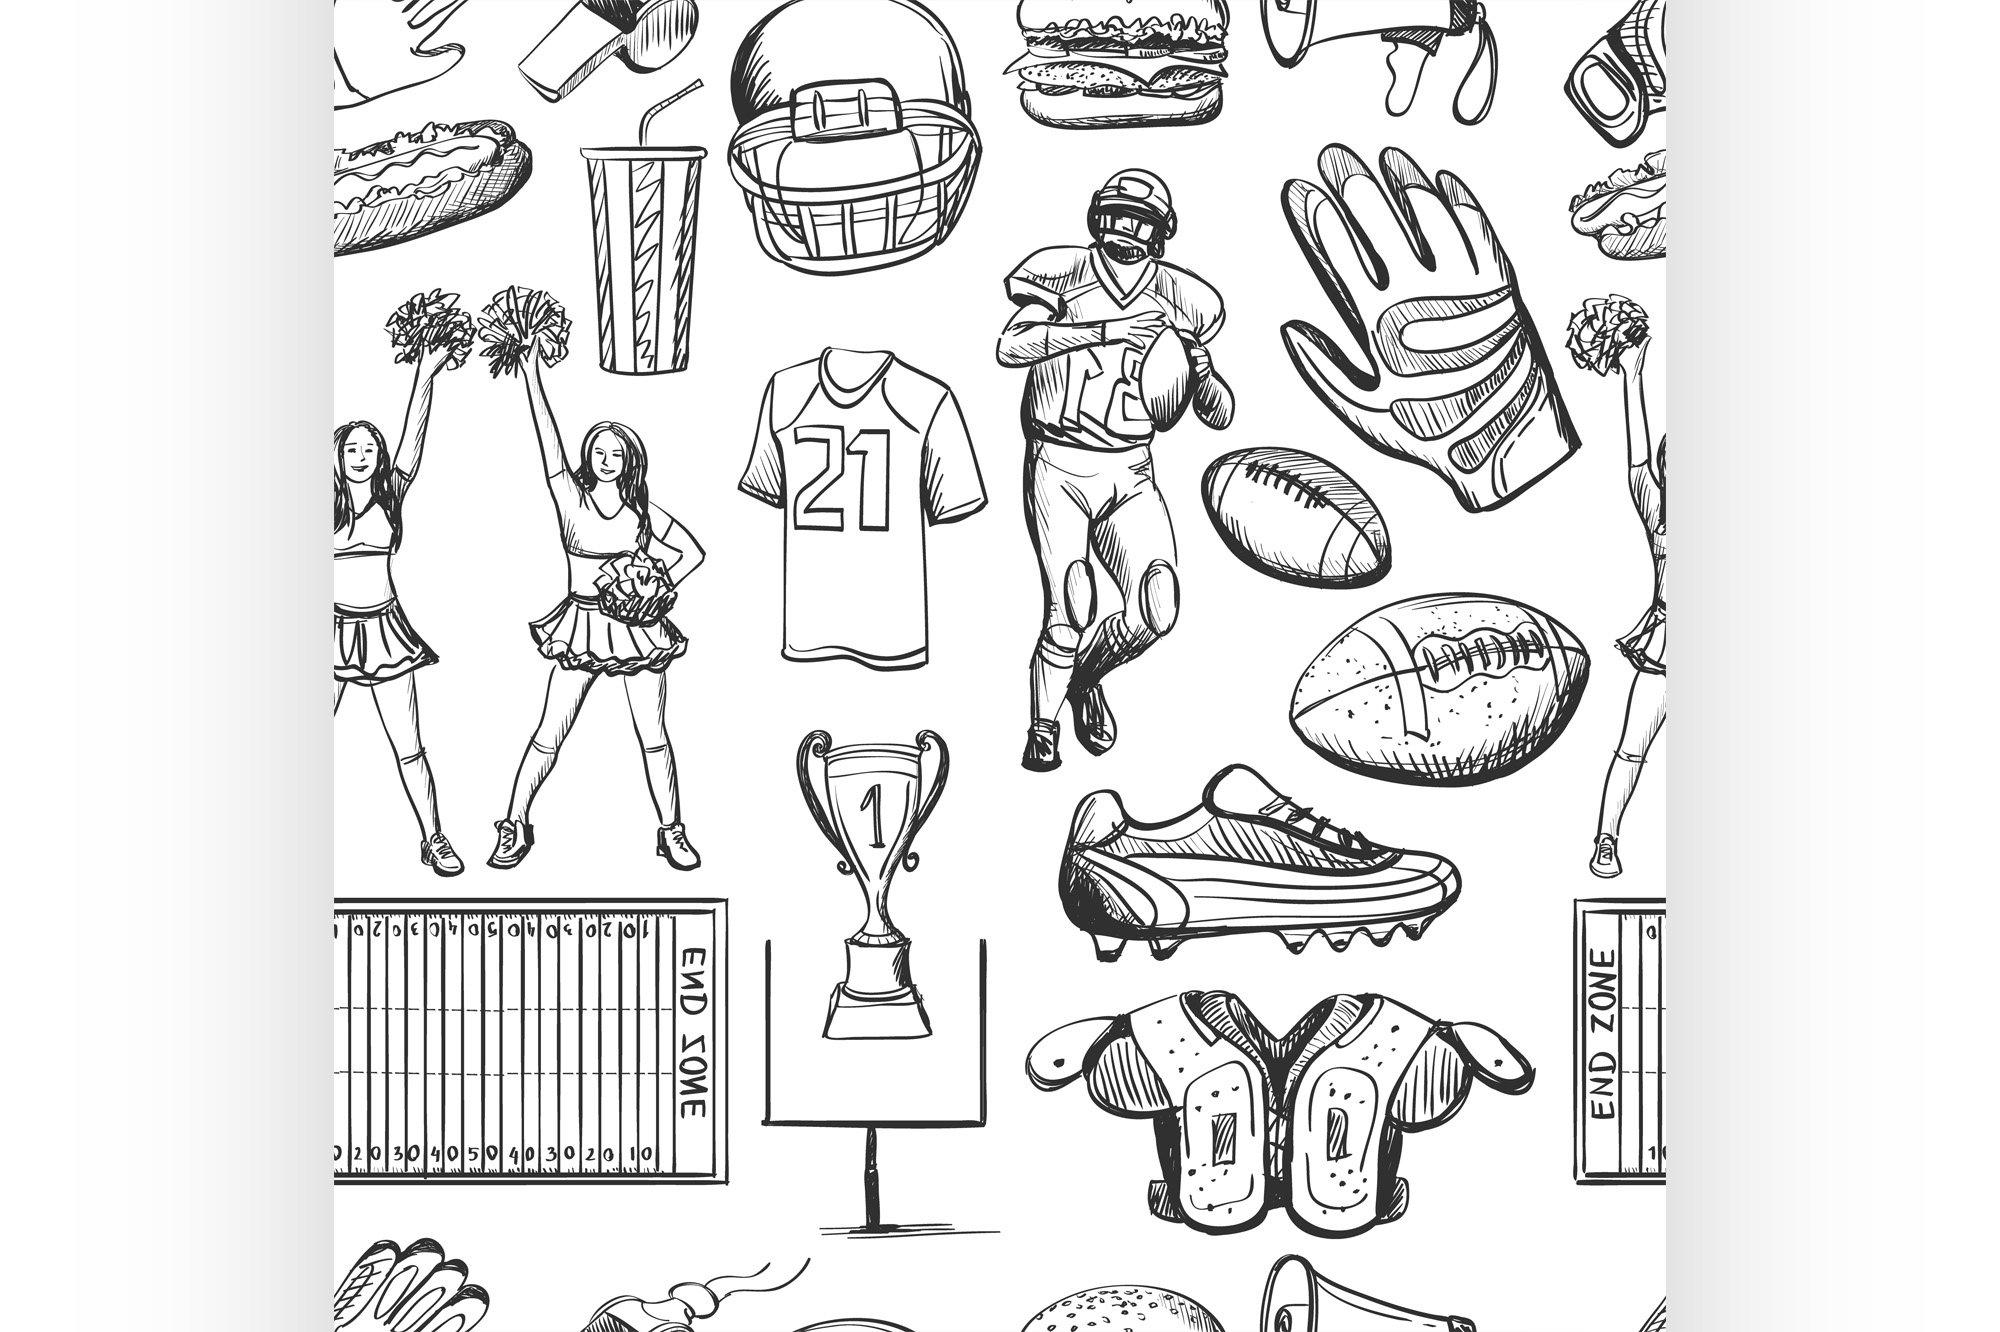 American Football Seamlees pattern example image 1